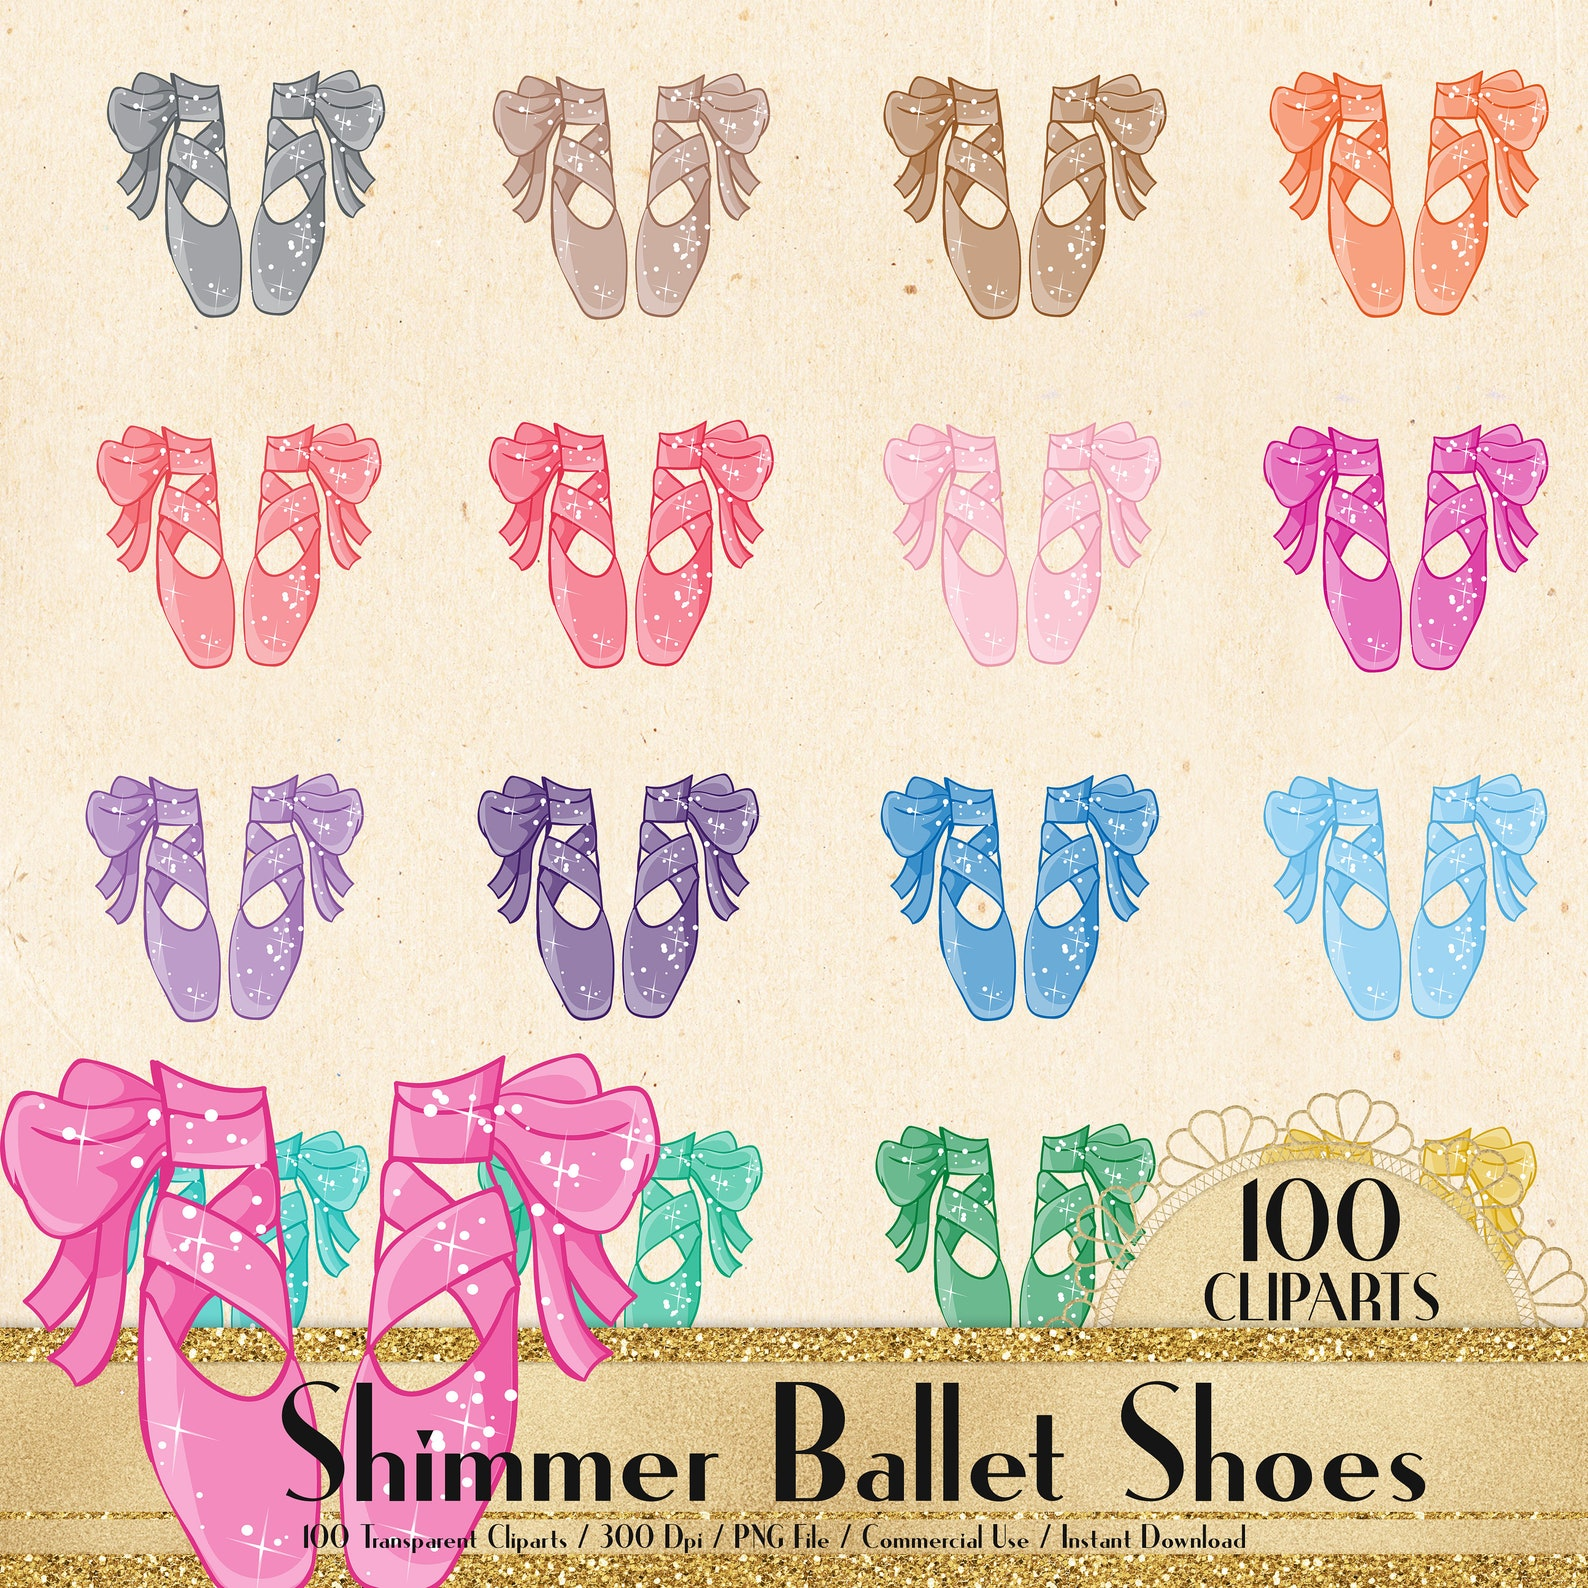 100 shimmer ballet shoes cliparts, planner clipart, scrapbook, princess shoes, fashion cliparts, bridal shoes, bridal shower, ba